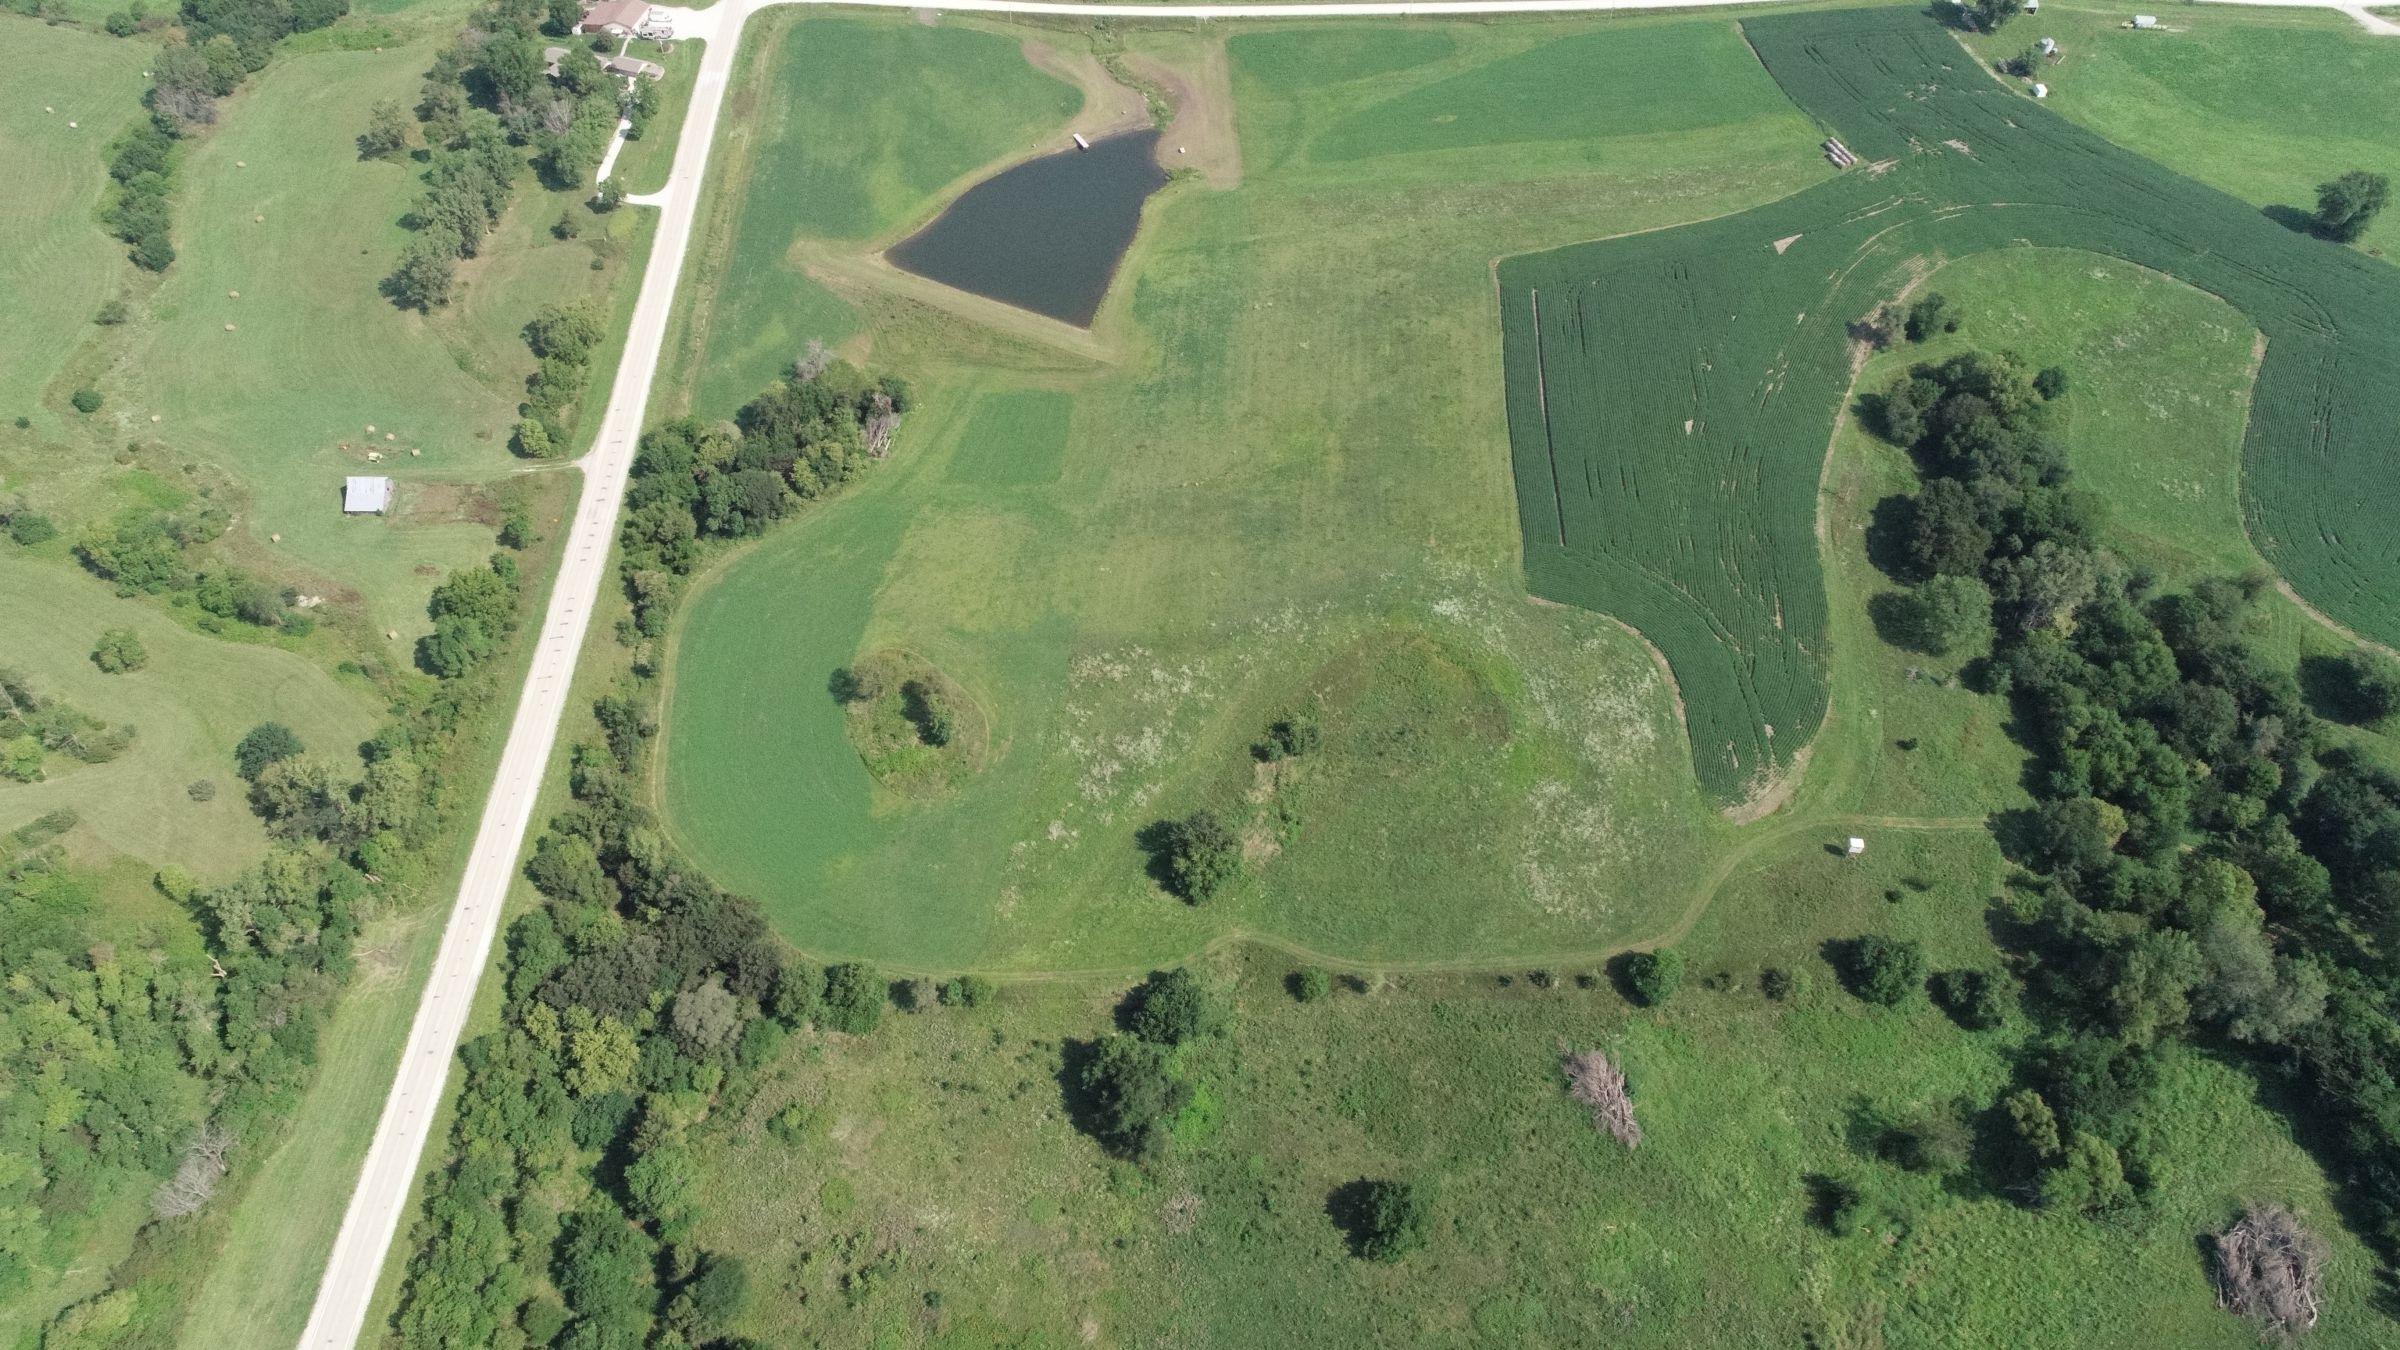 land-warren-county-iowa-9-acres-listing-number-15697-1-2021-08-24-224725.JPG